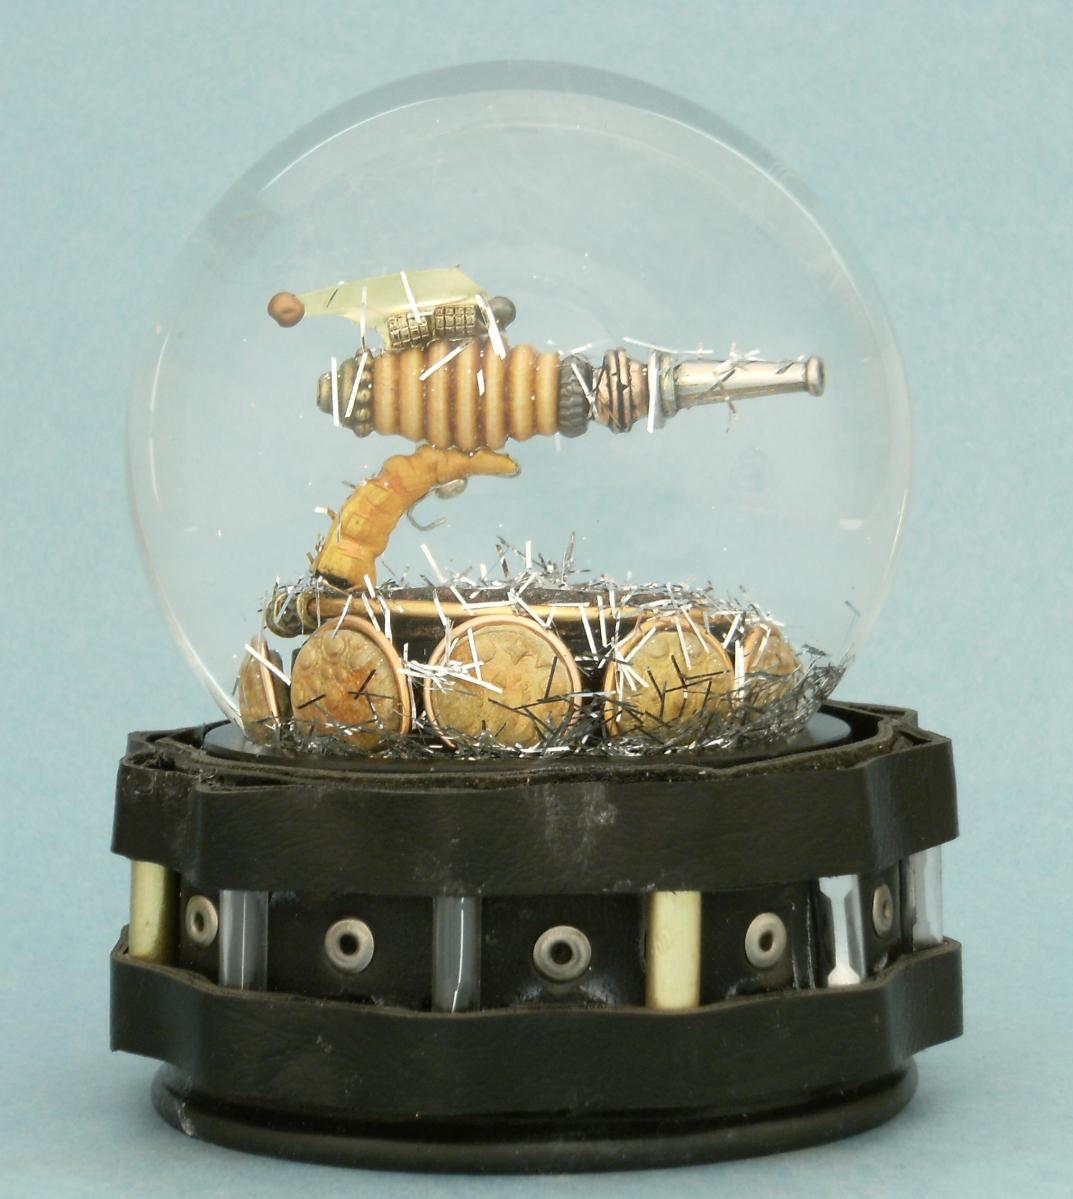 Ray Gun Globe, Camryn Forrest Designs 2012